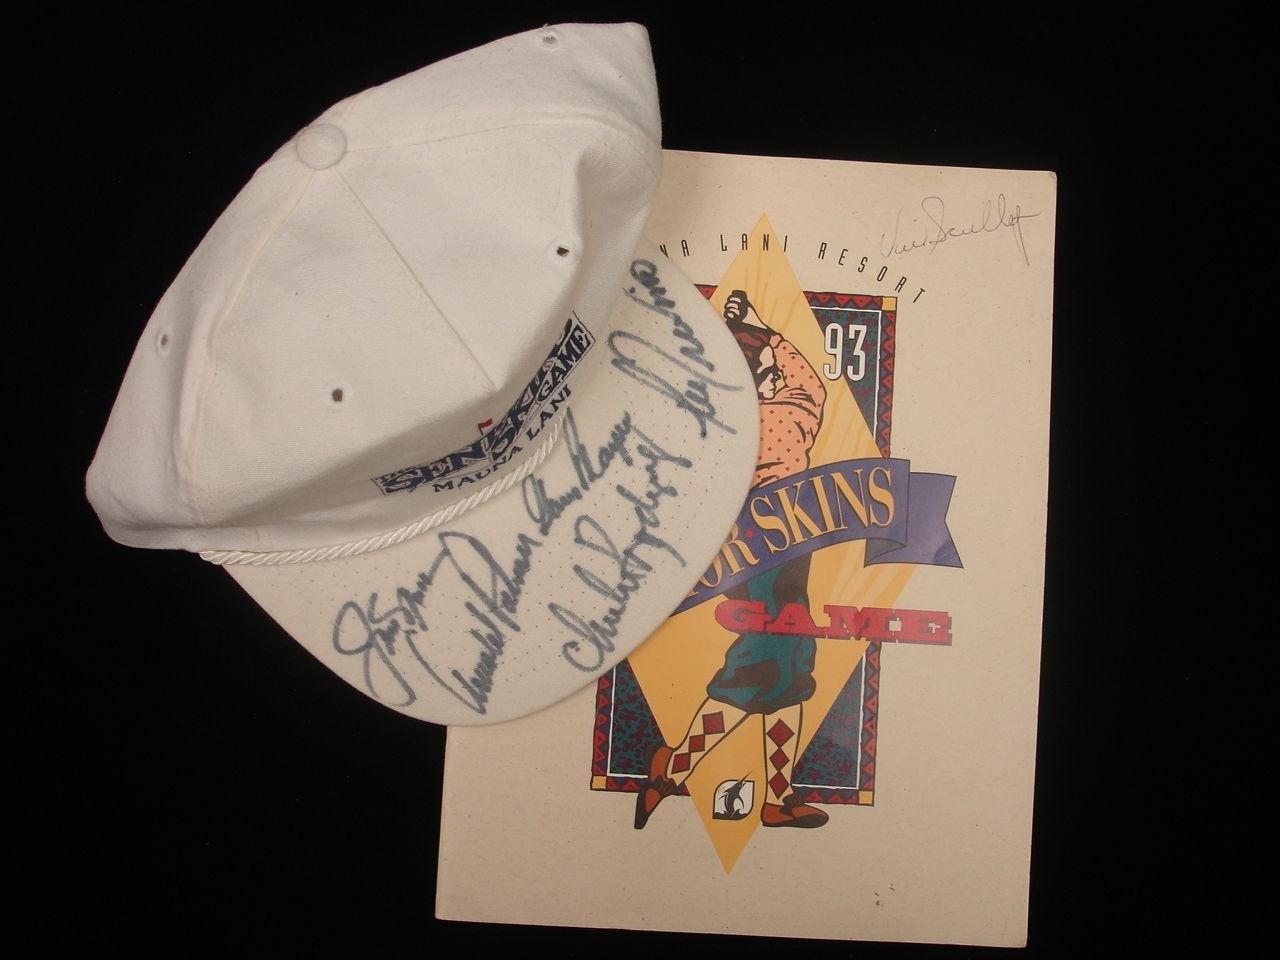 1993 Senior Skins Game Golf Autographed Program & Hat Palmer, Nicklaus + 4 Autographed Golf Hats and Visors